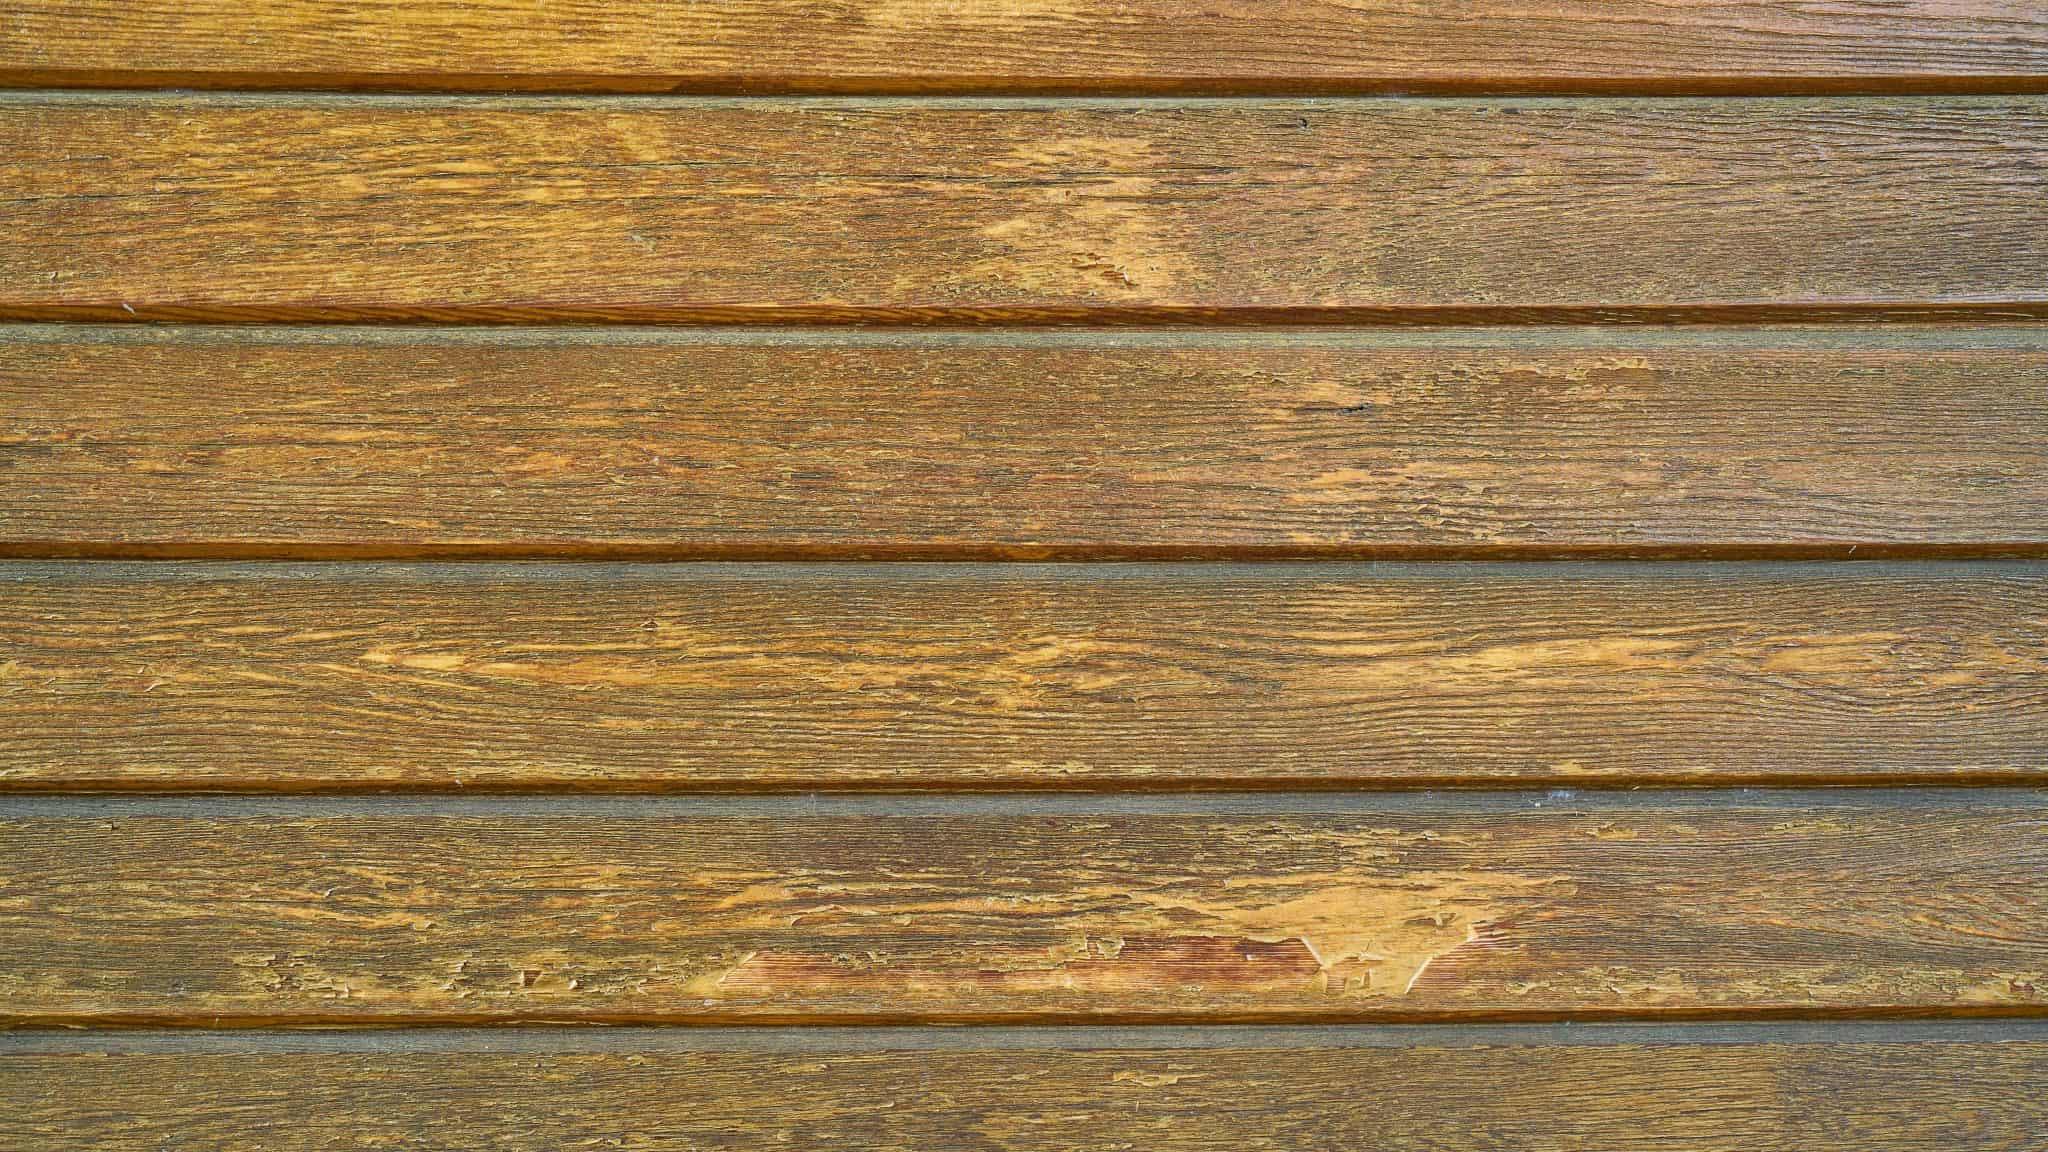 tongue and groove horizontal timber panels